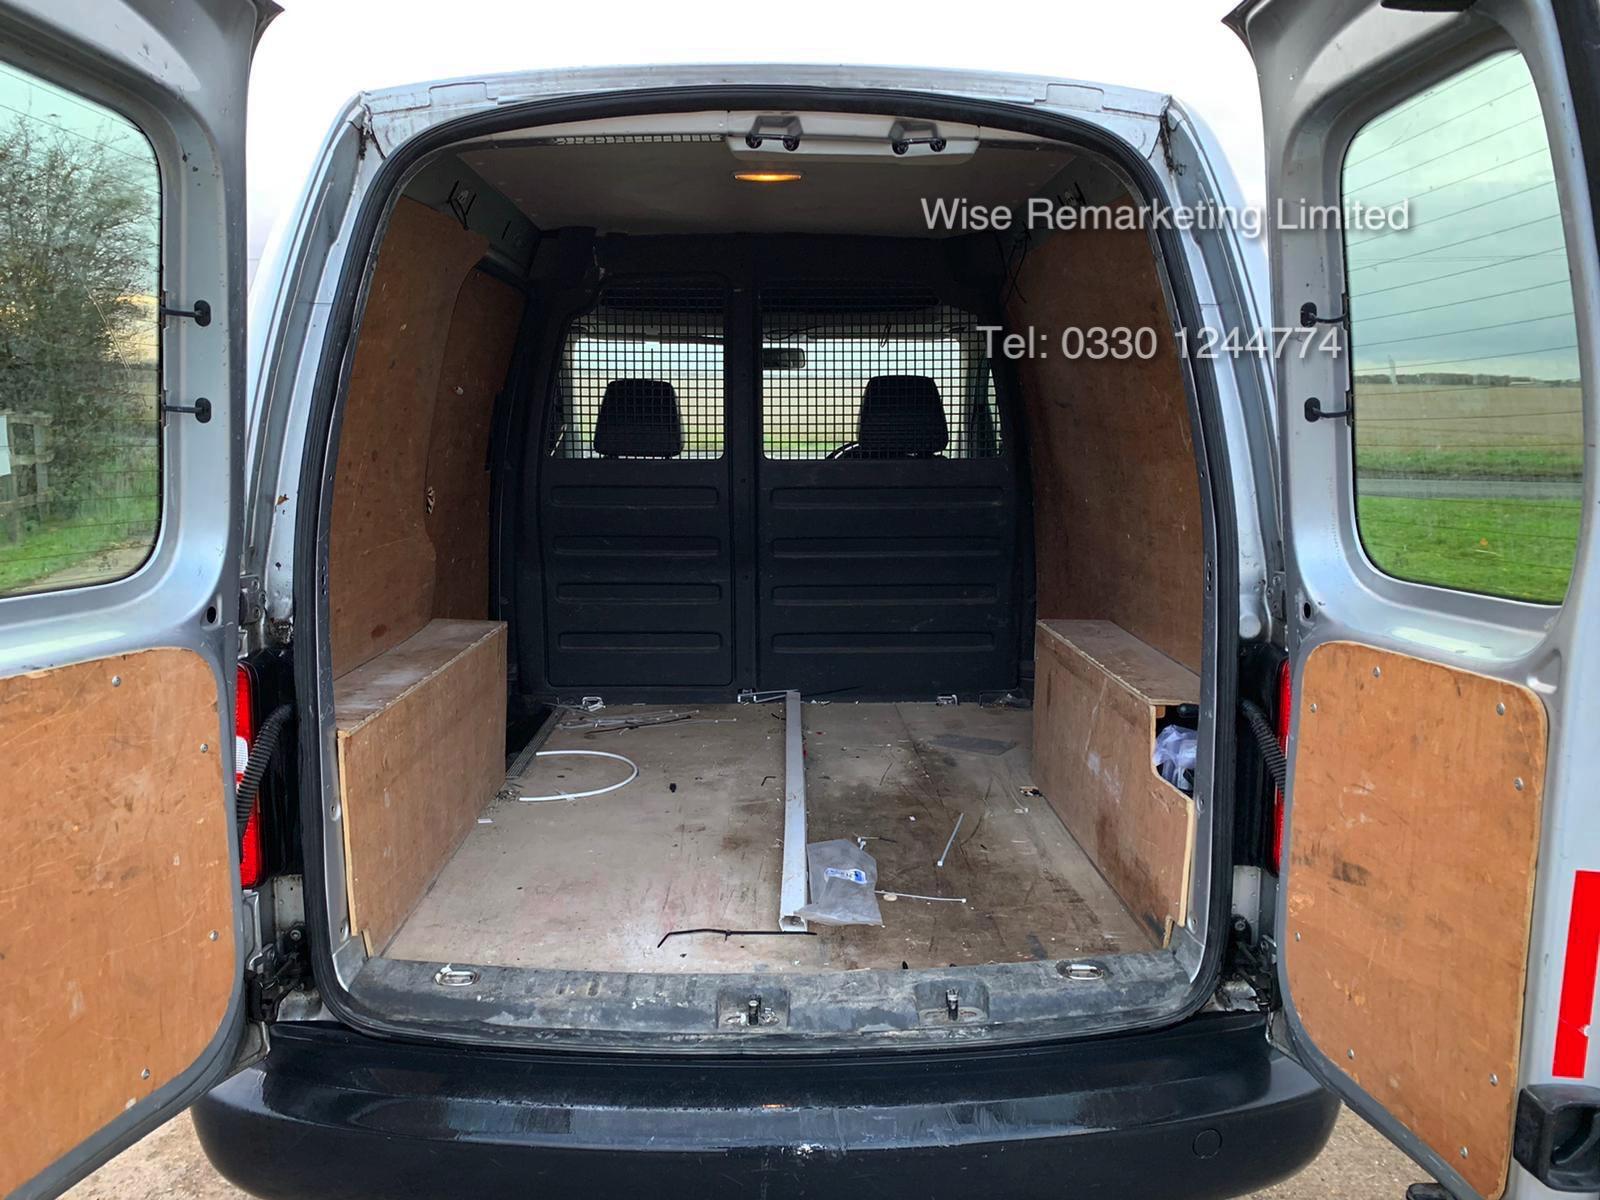 Volkswagen Caddy C20 1.6 TDI - 2013 13 Reg - Silver - Side Loading Door - Ply Lined - Image 10 of 18